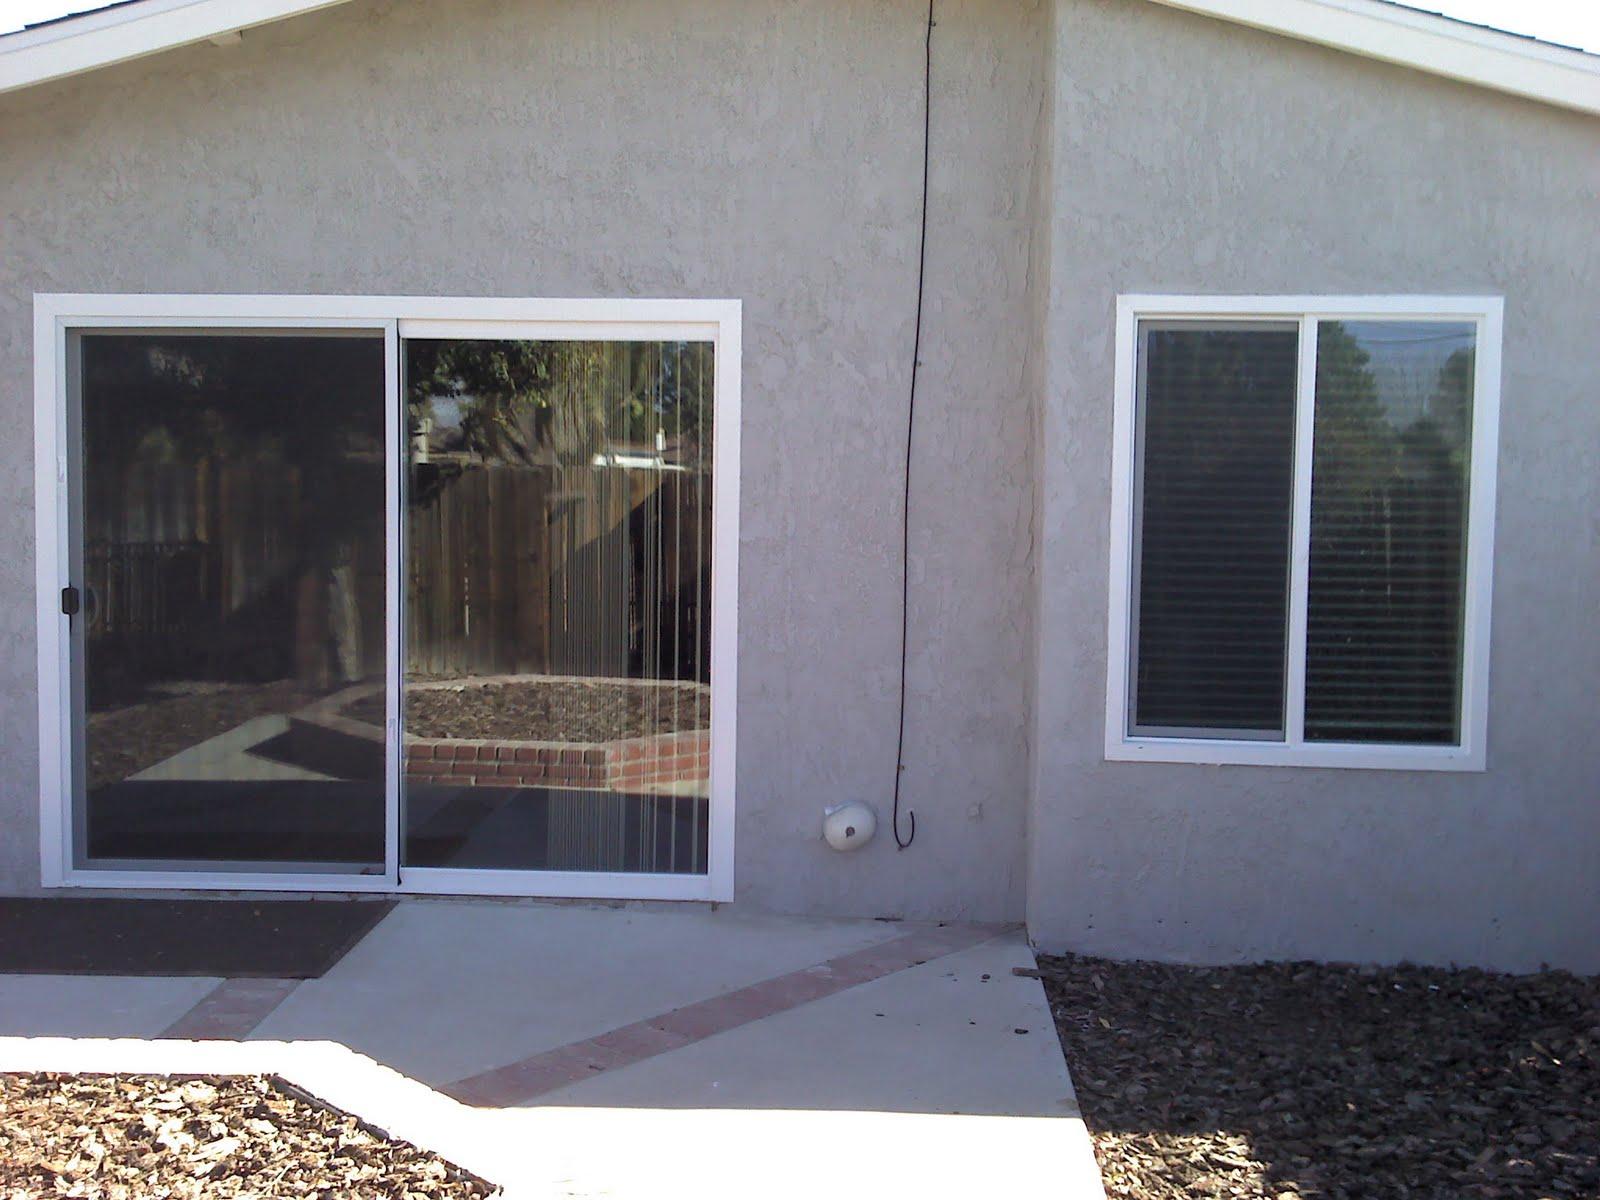 Lapham Construction Energy Efficient Windows And Doors In